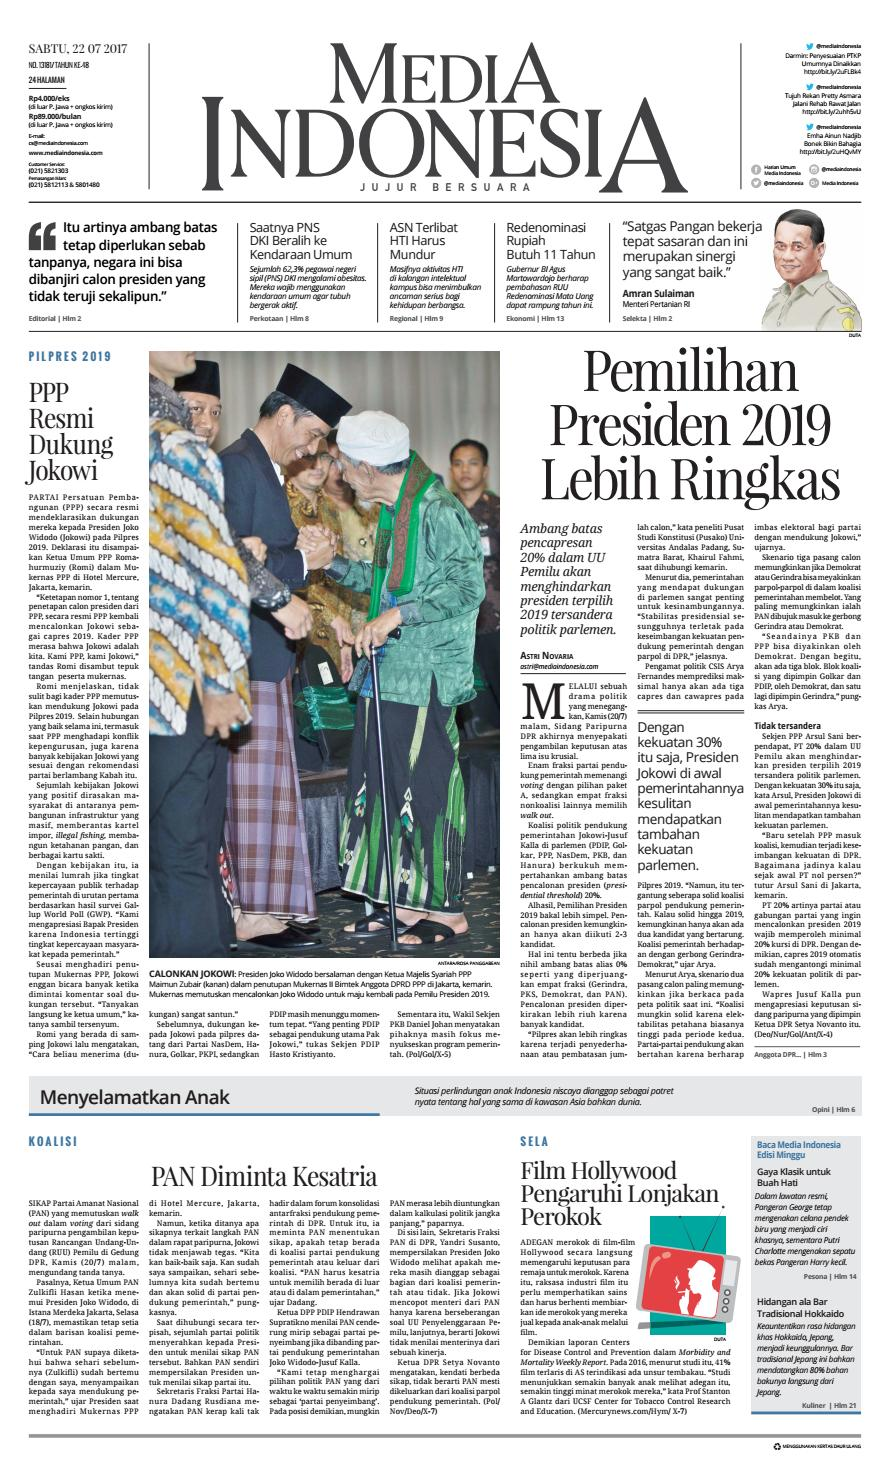 Media Indonesia 22 07 2017 27072017053713 By Oppah Issuu